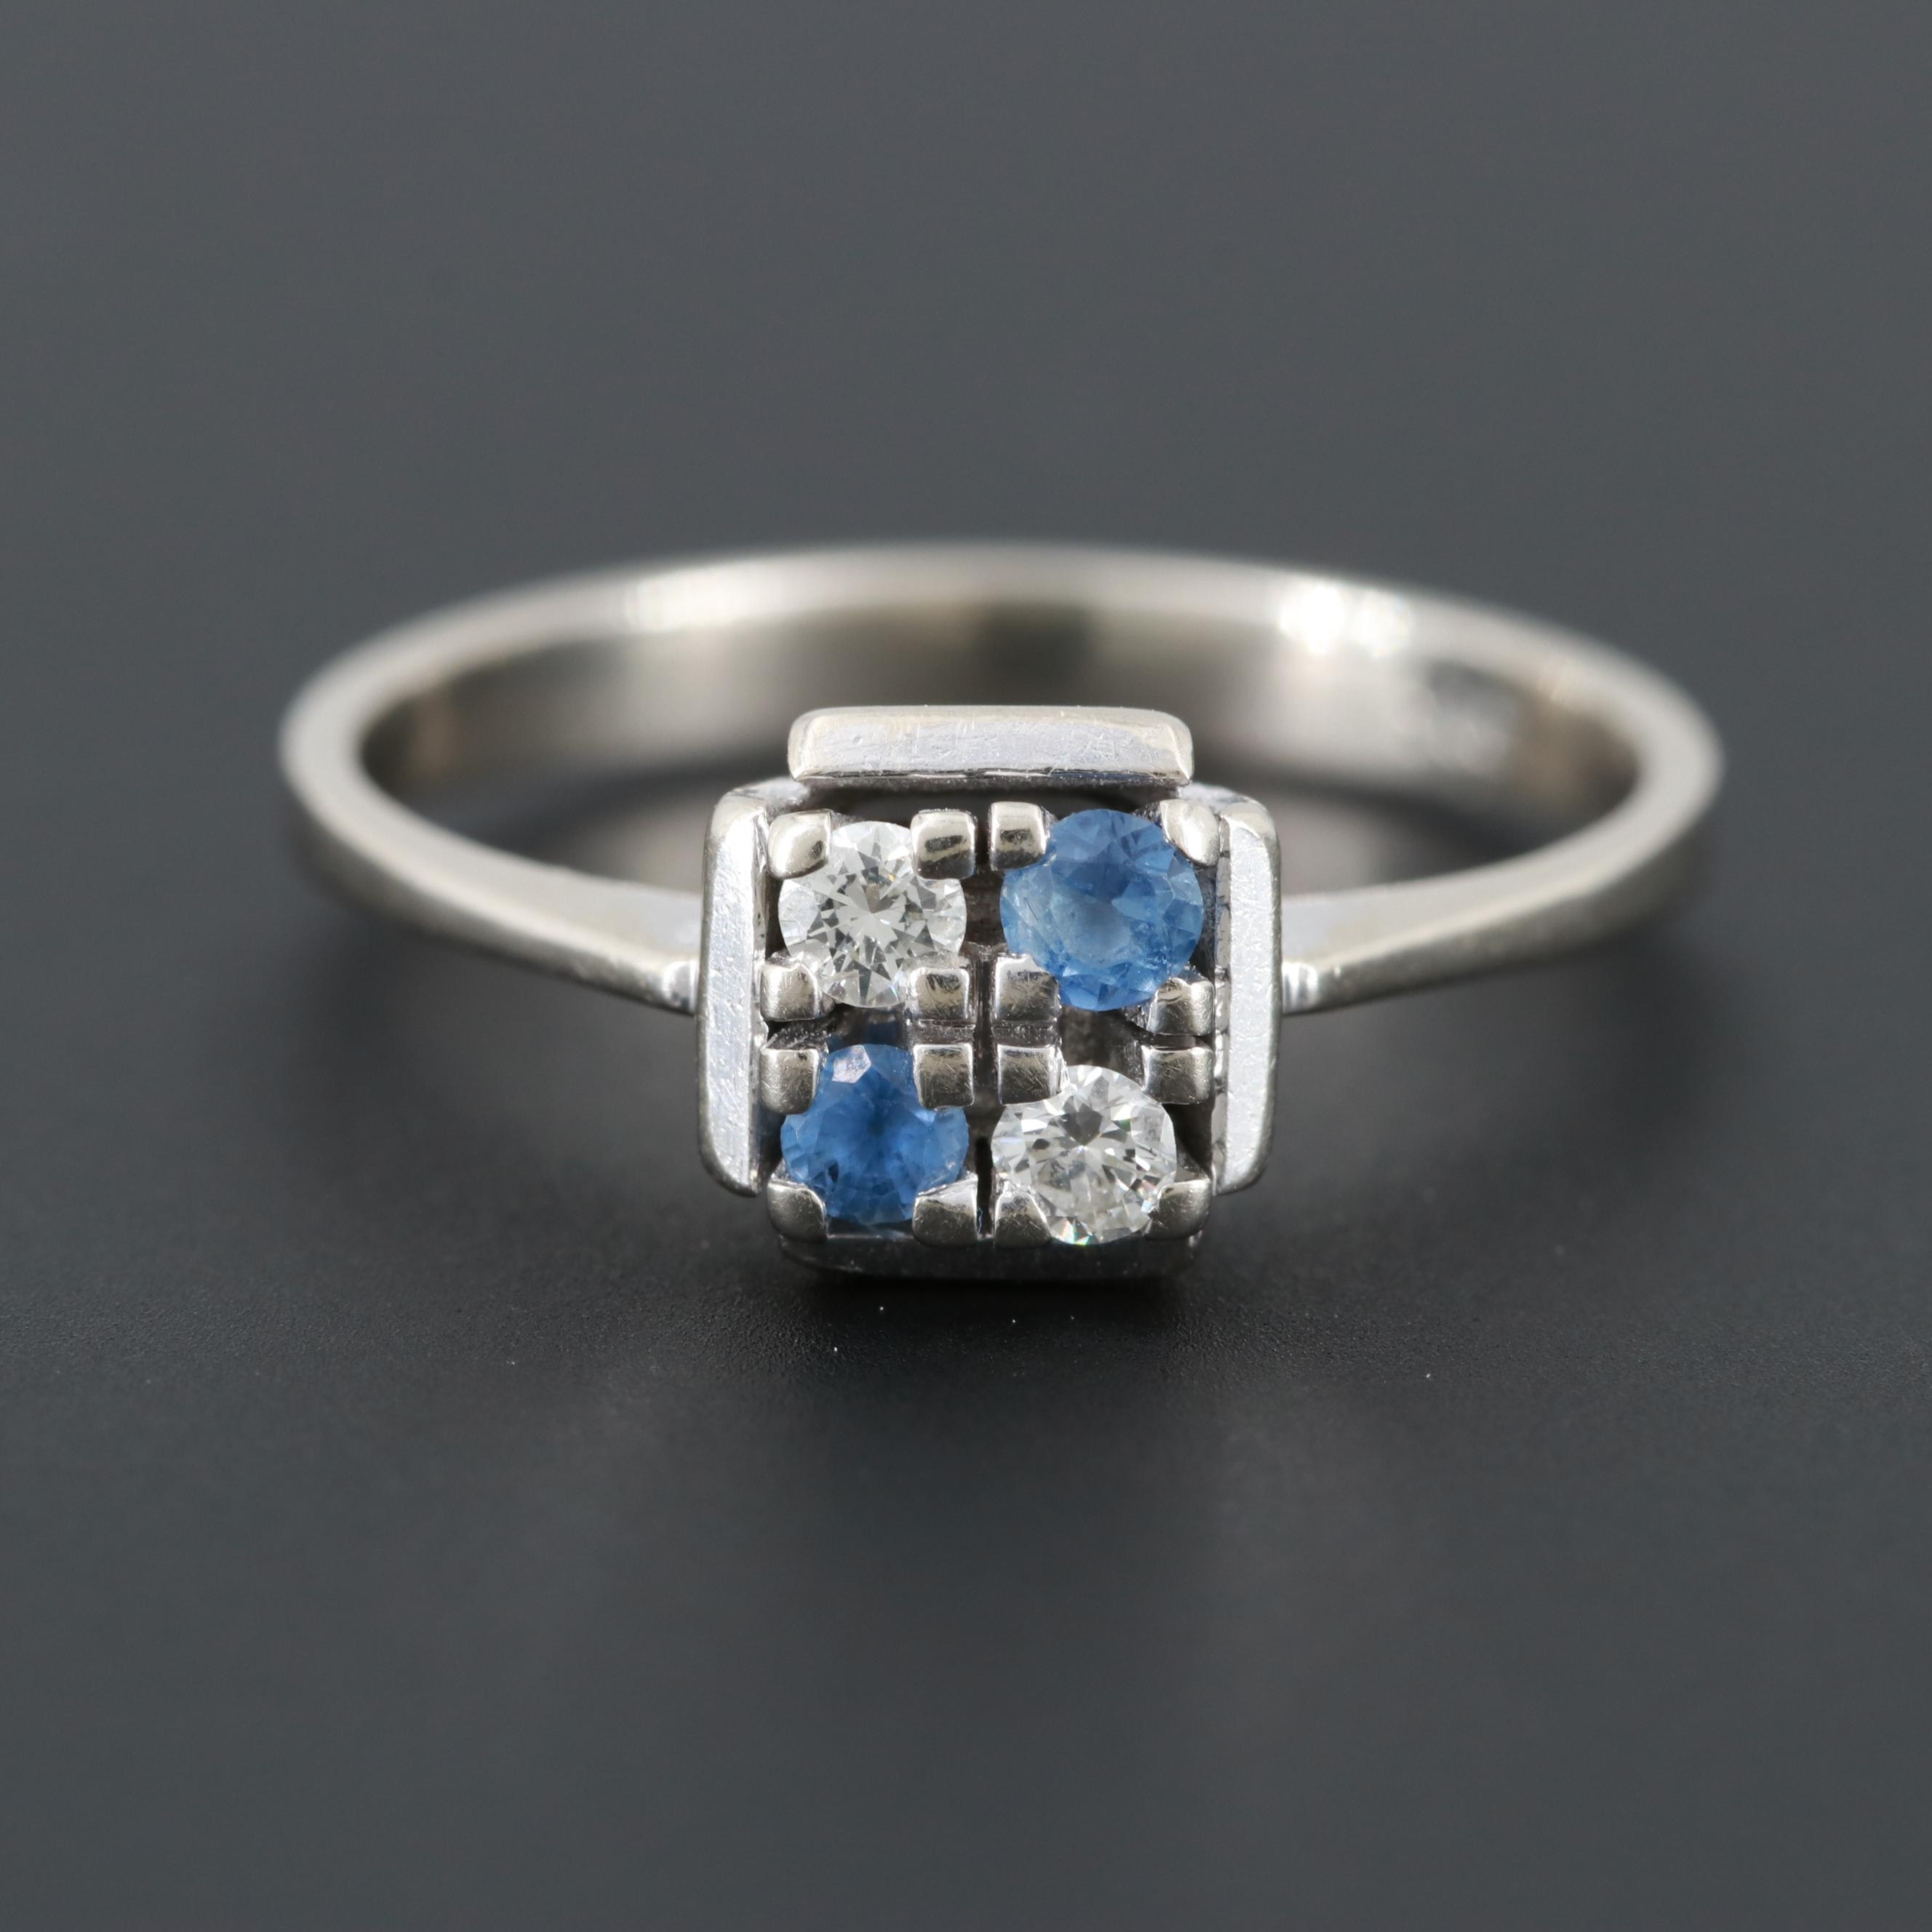 14K White Gold Diamond and Sapphire Ring